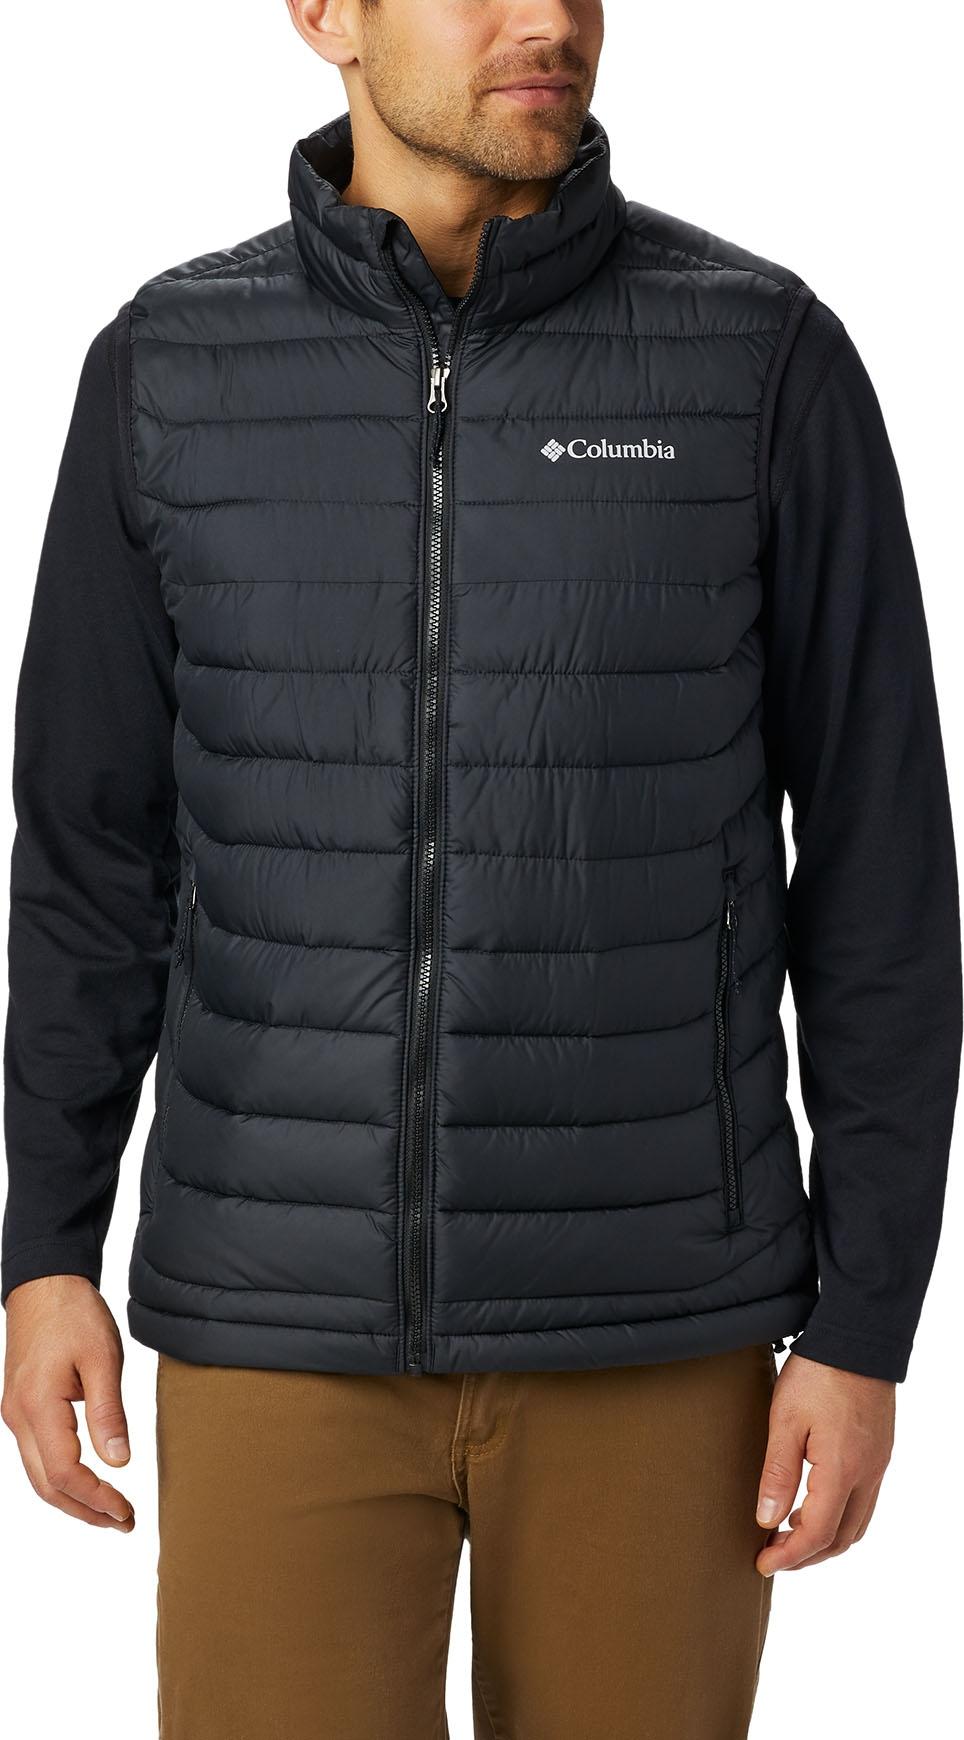 Powder Lite Vest Black